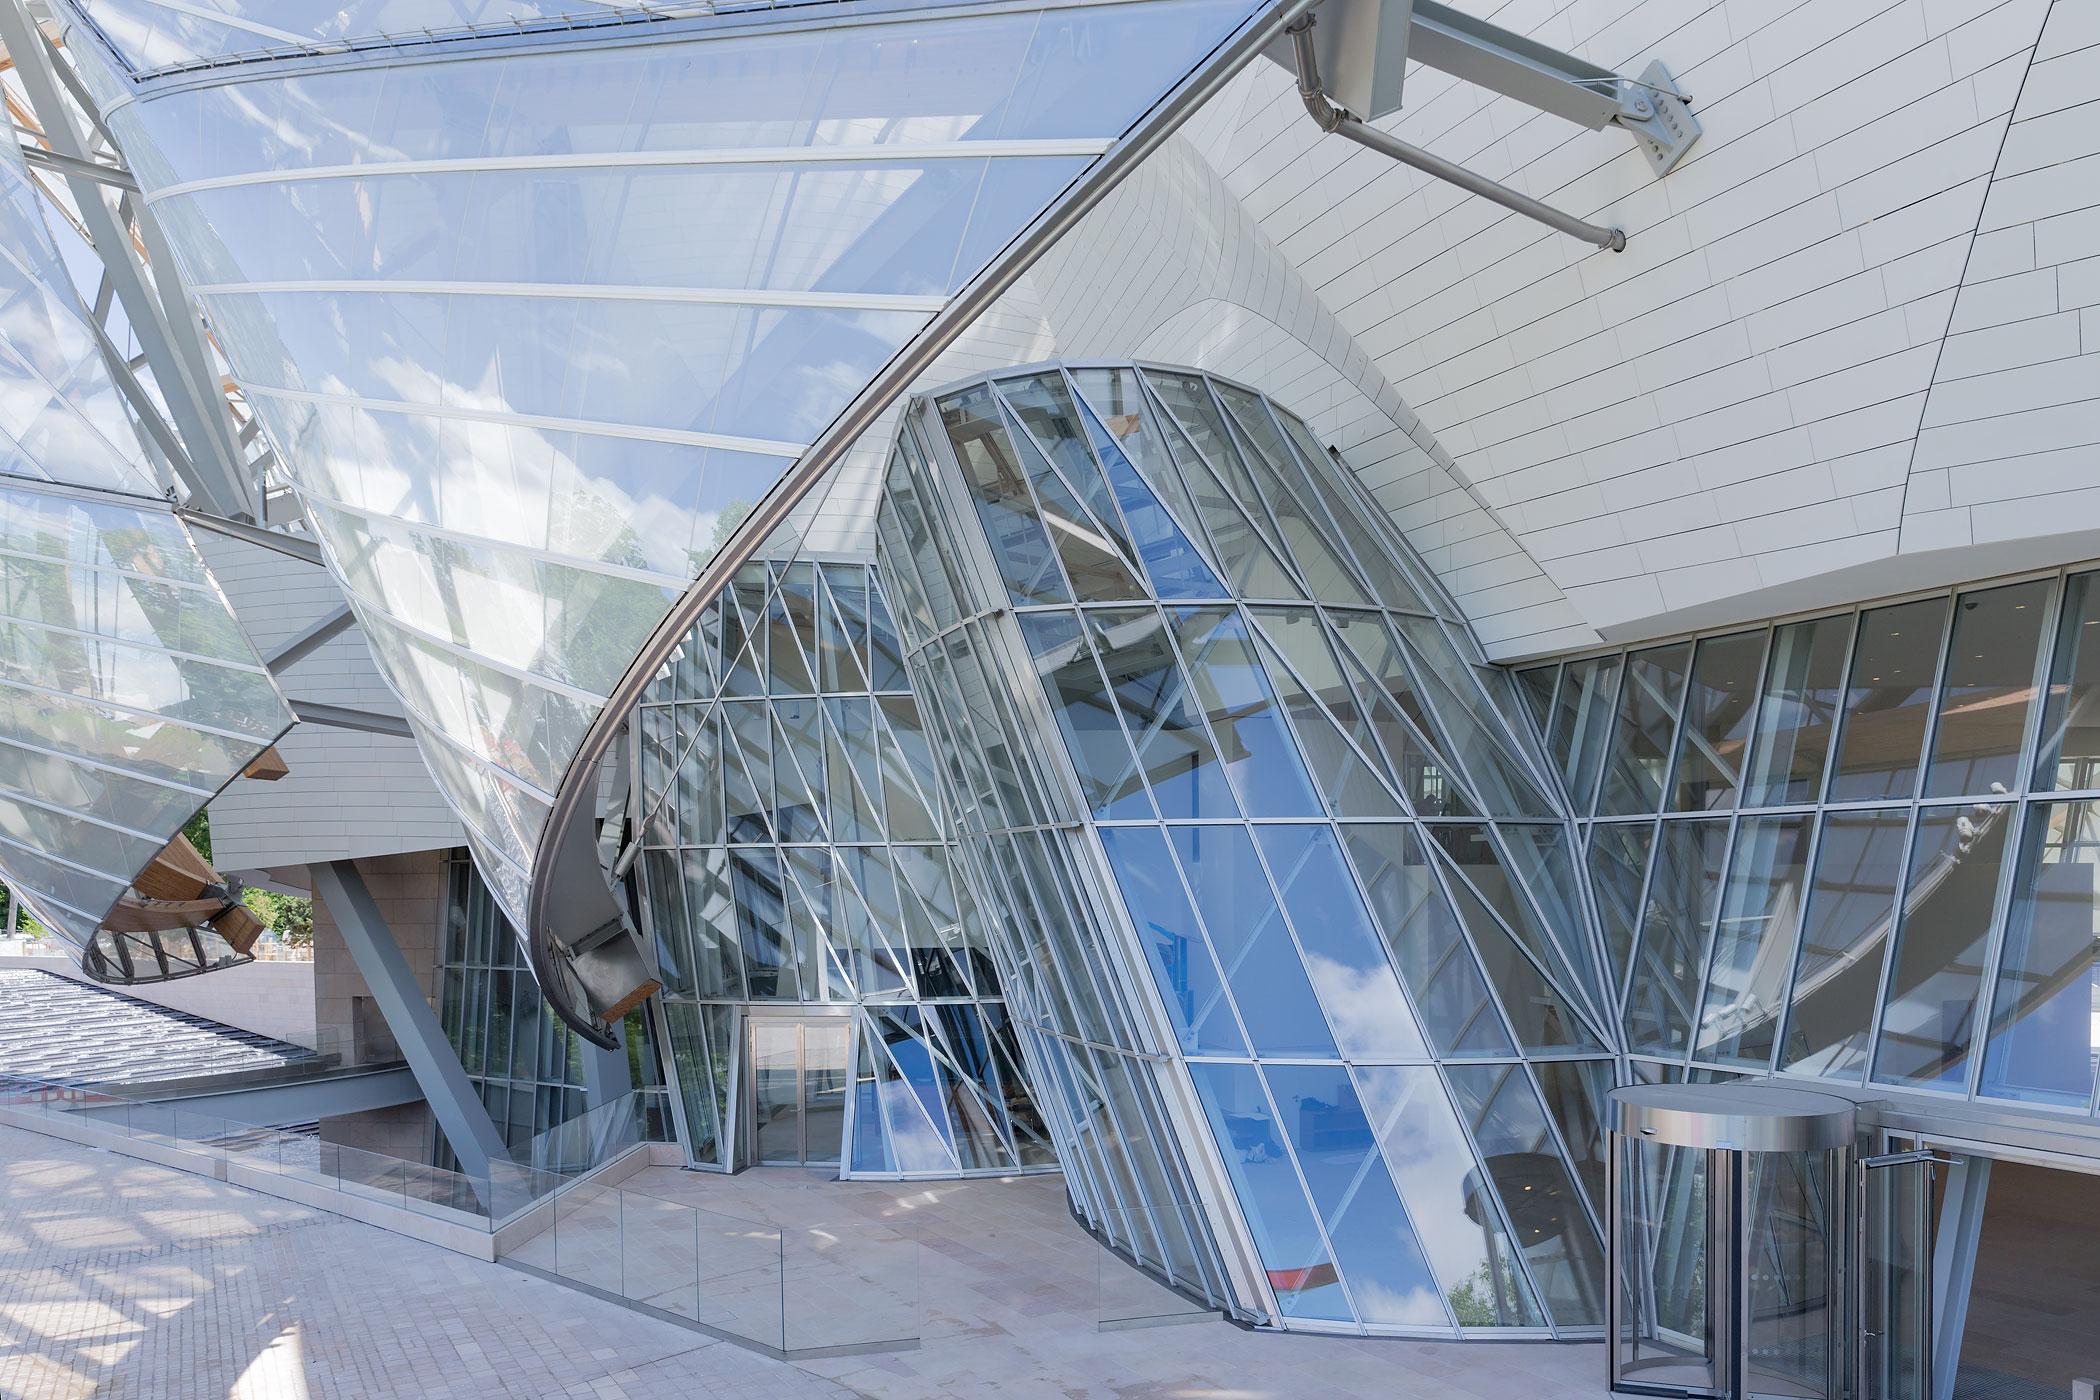 Fondation Louis Vuitton dibangun menggunakan 36.000 kaca.